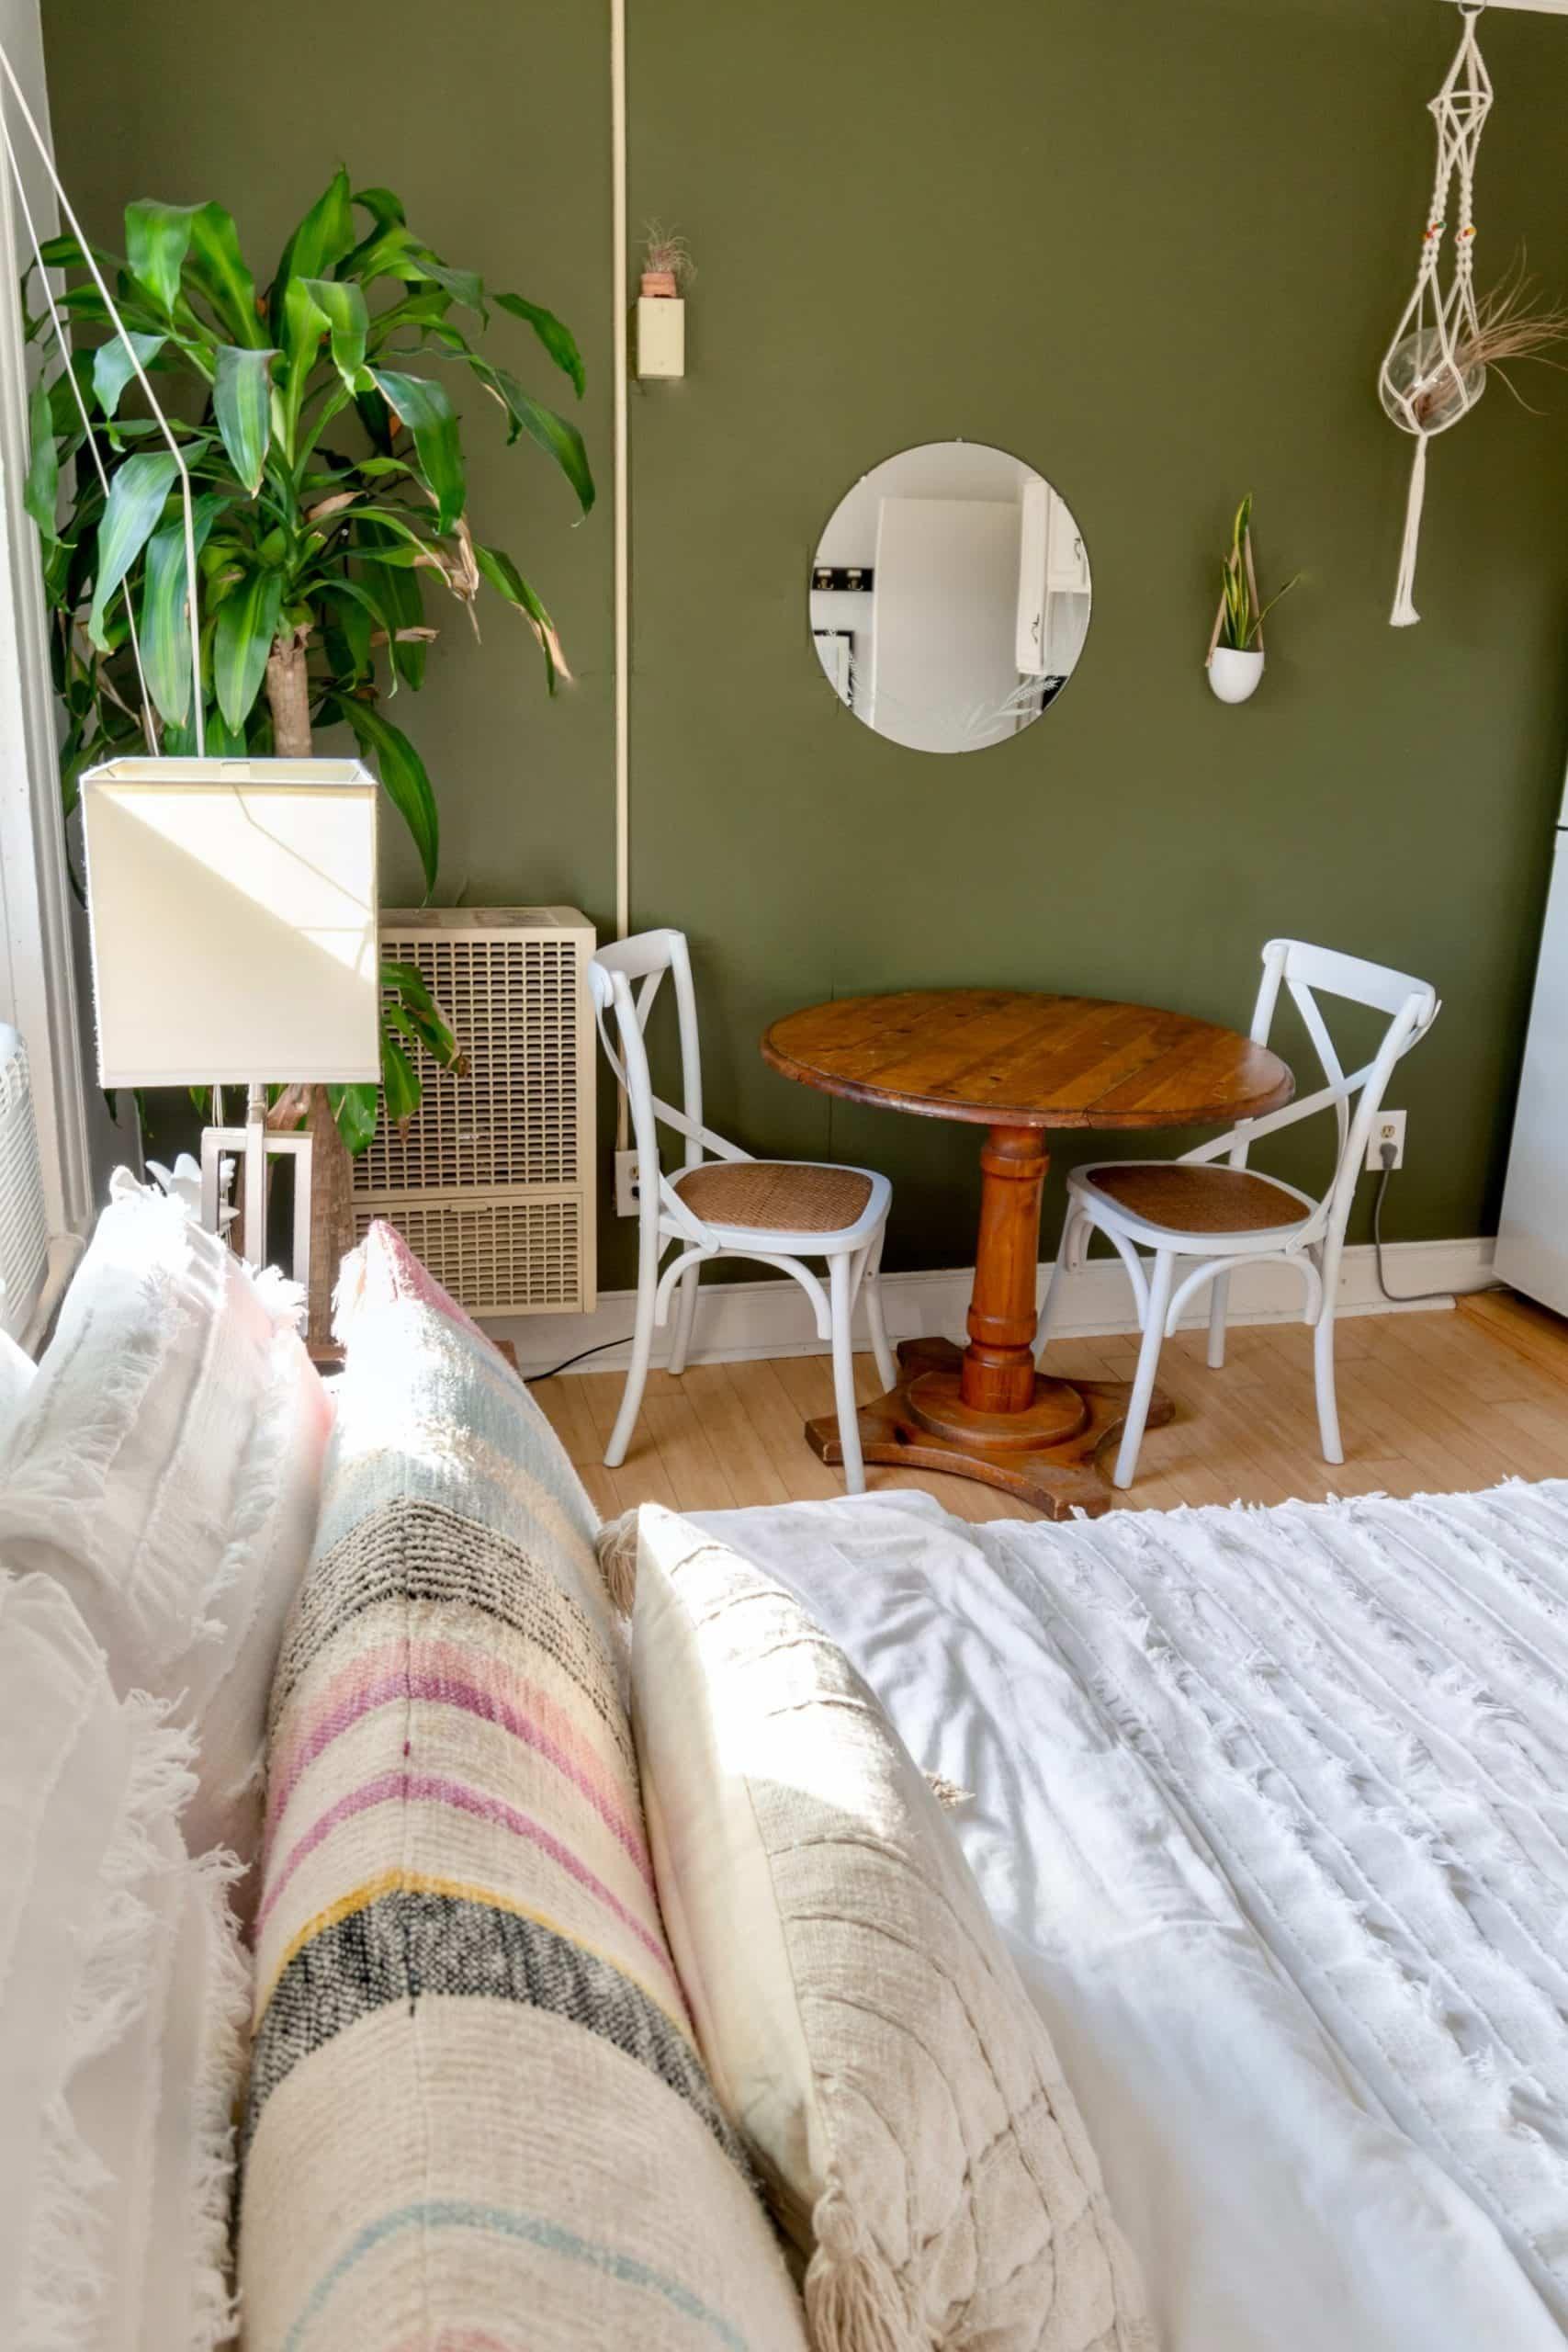 Guest Bedroom Set Article Image